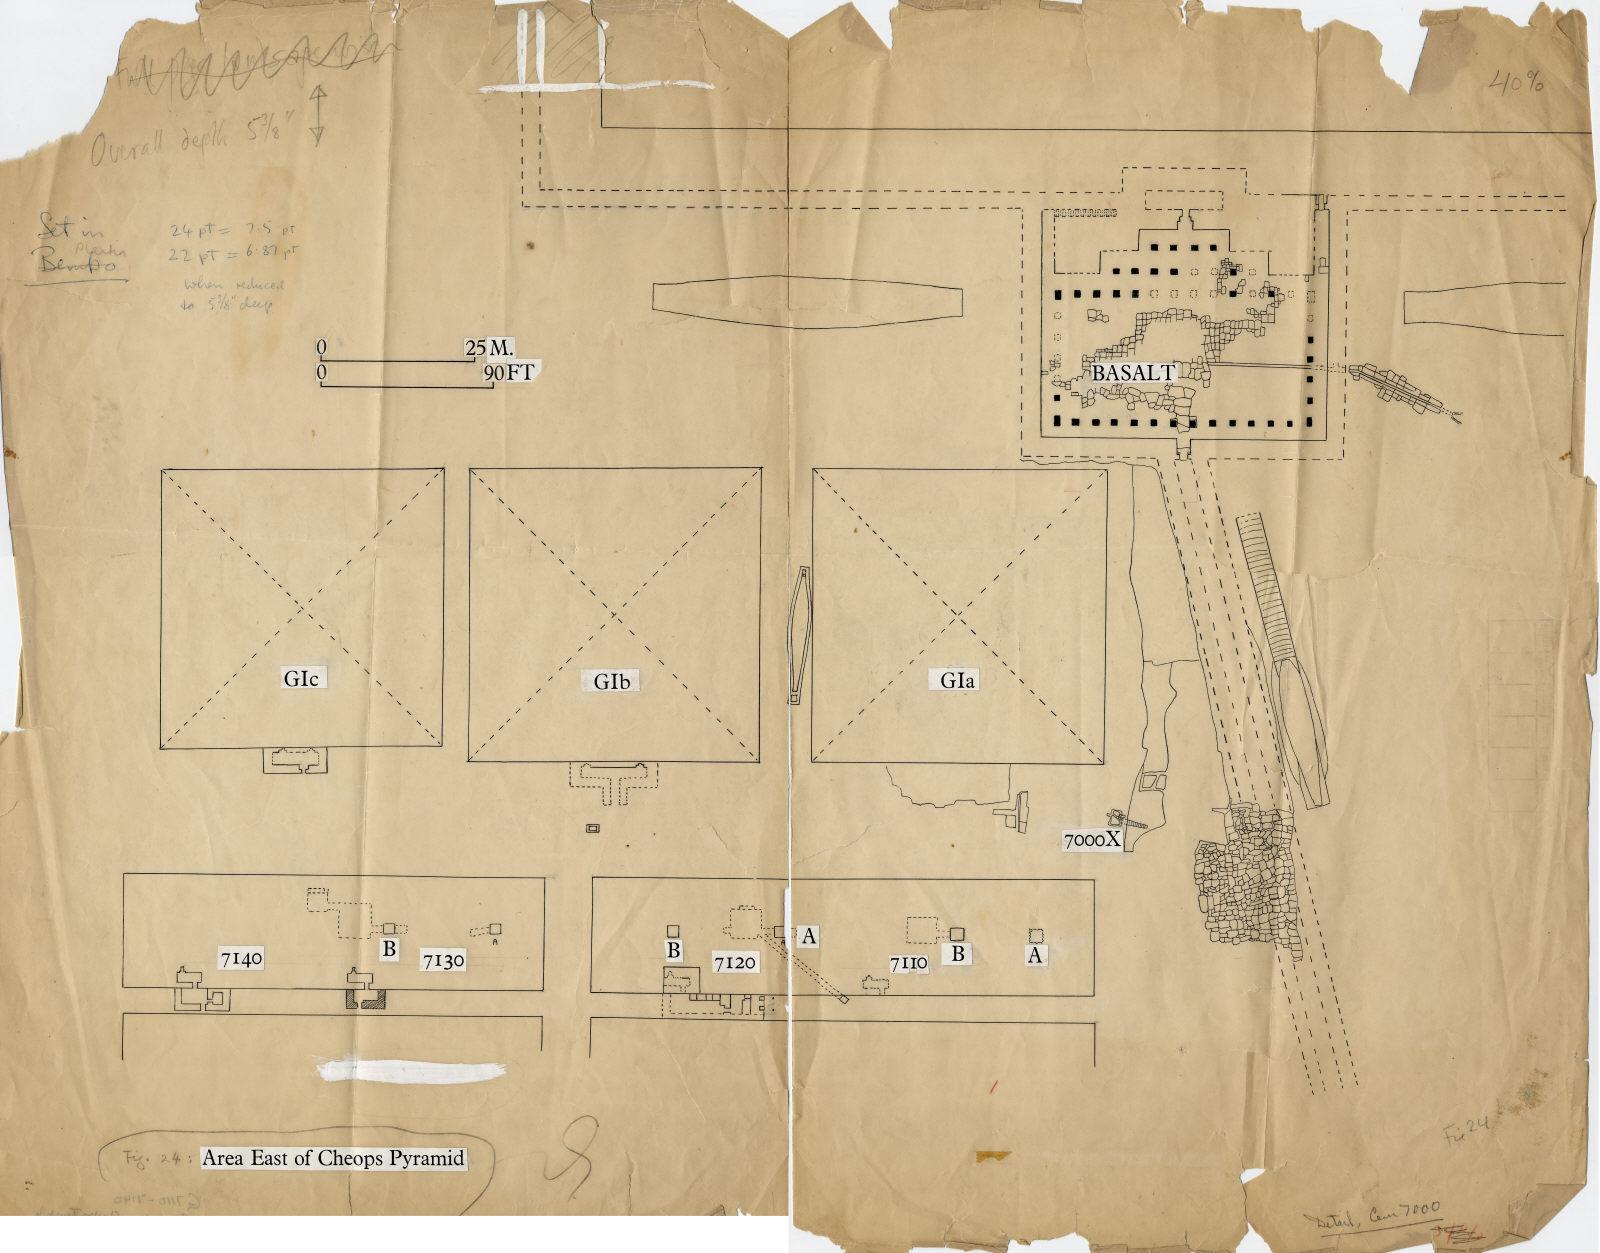 Maps and plans: Plan of Khufu Pyramid, Khufu Pyramid Temple, G I-a, G I-b, G I-c, G 7000 X, G 7110-7120, G 7130-7140